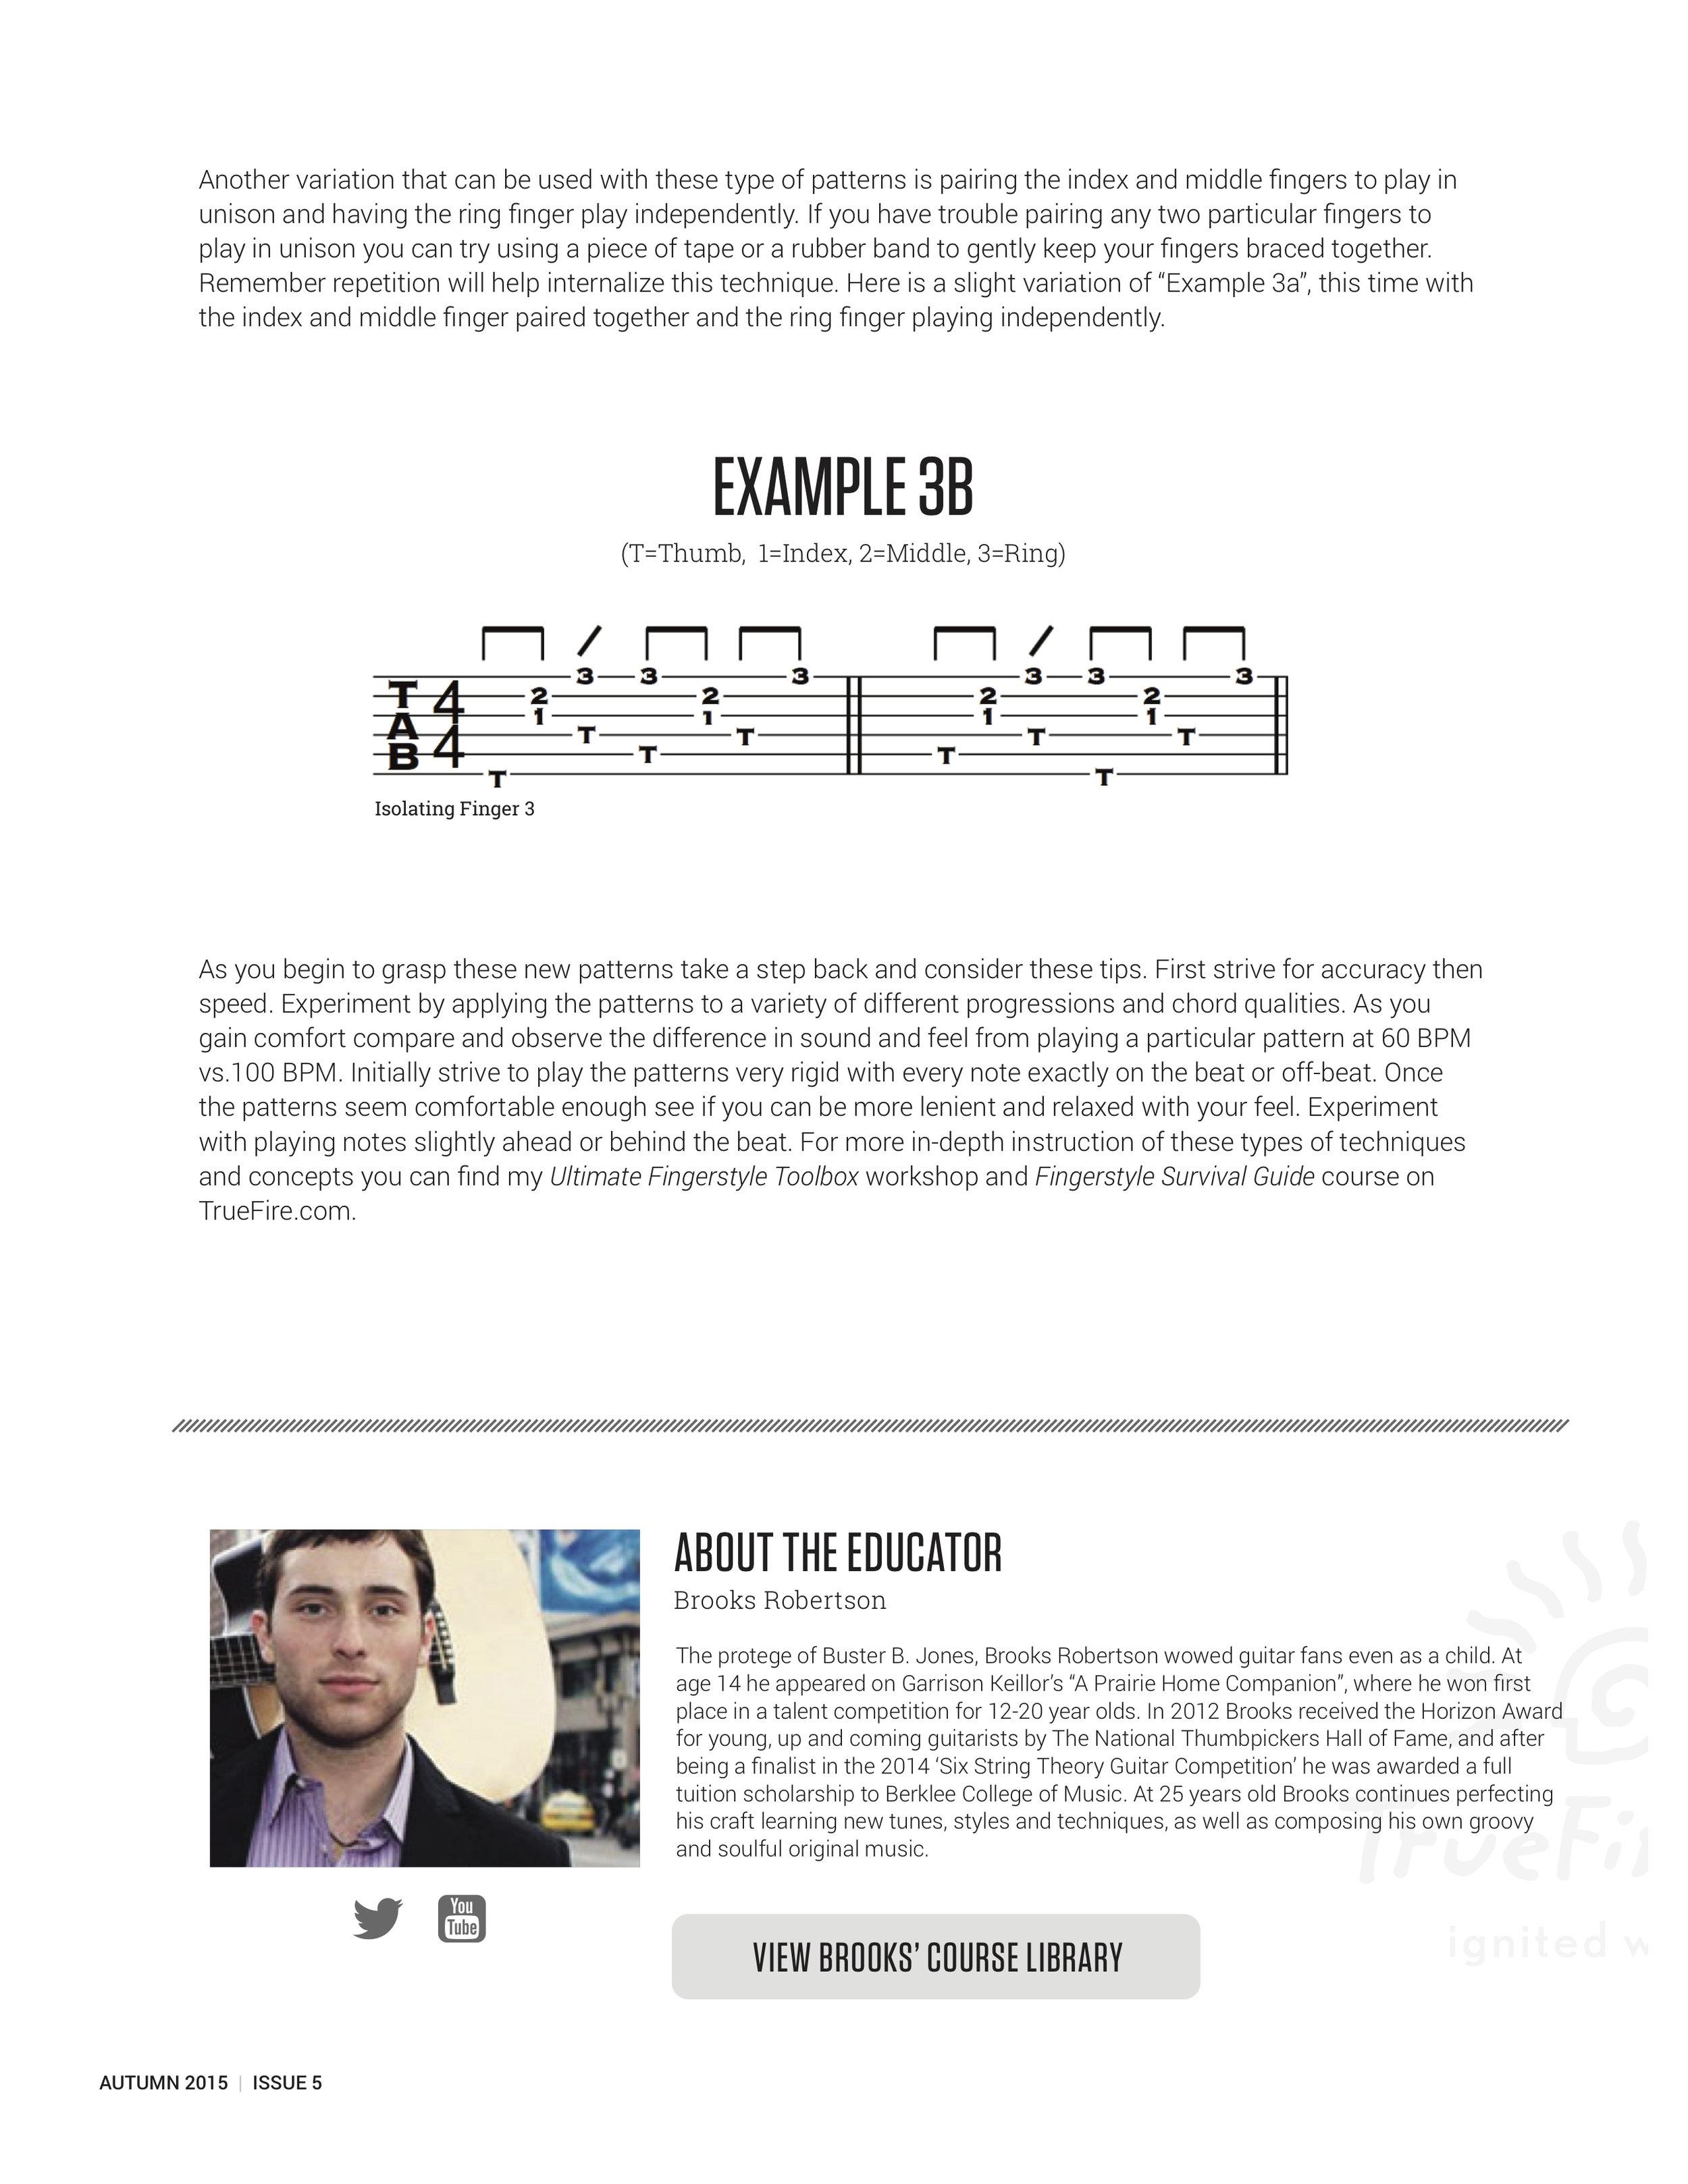 Double Stop Picking Patterns Article RIFFp3.jpg